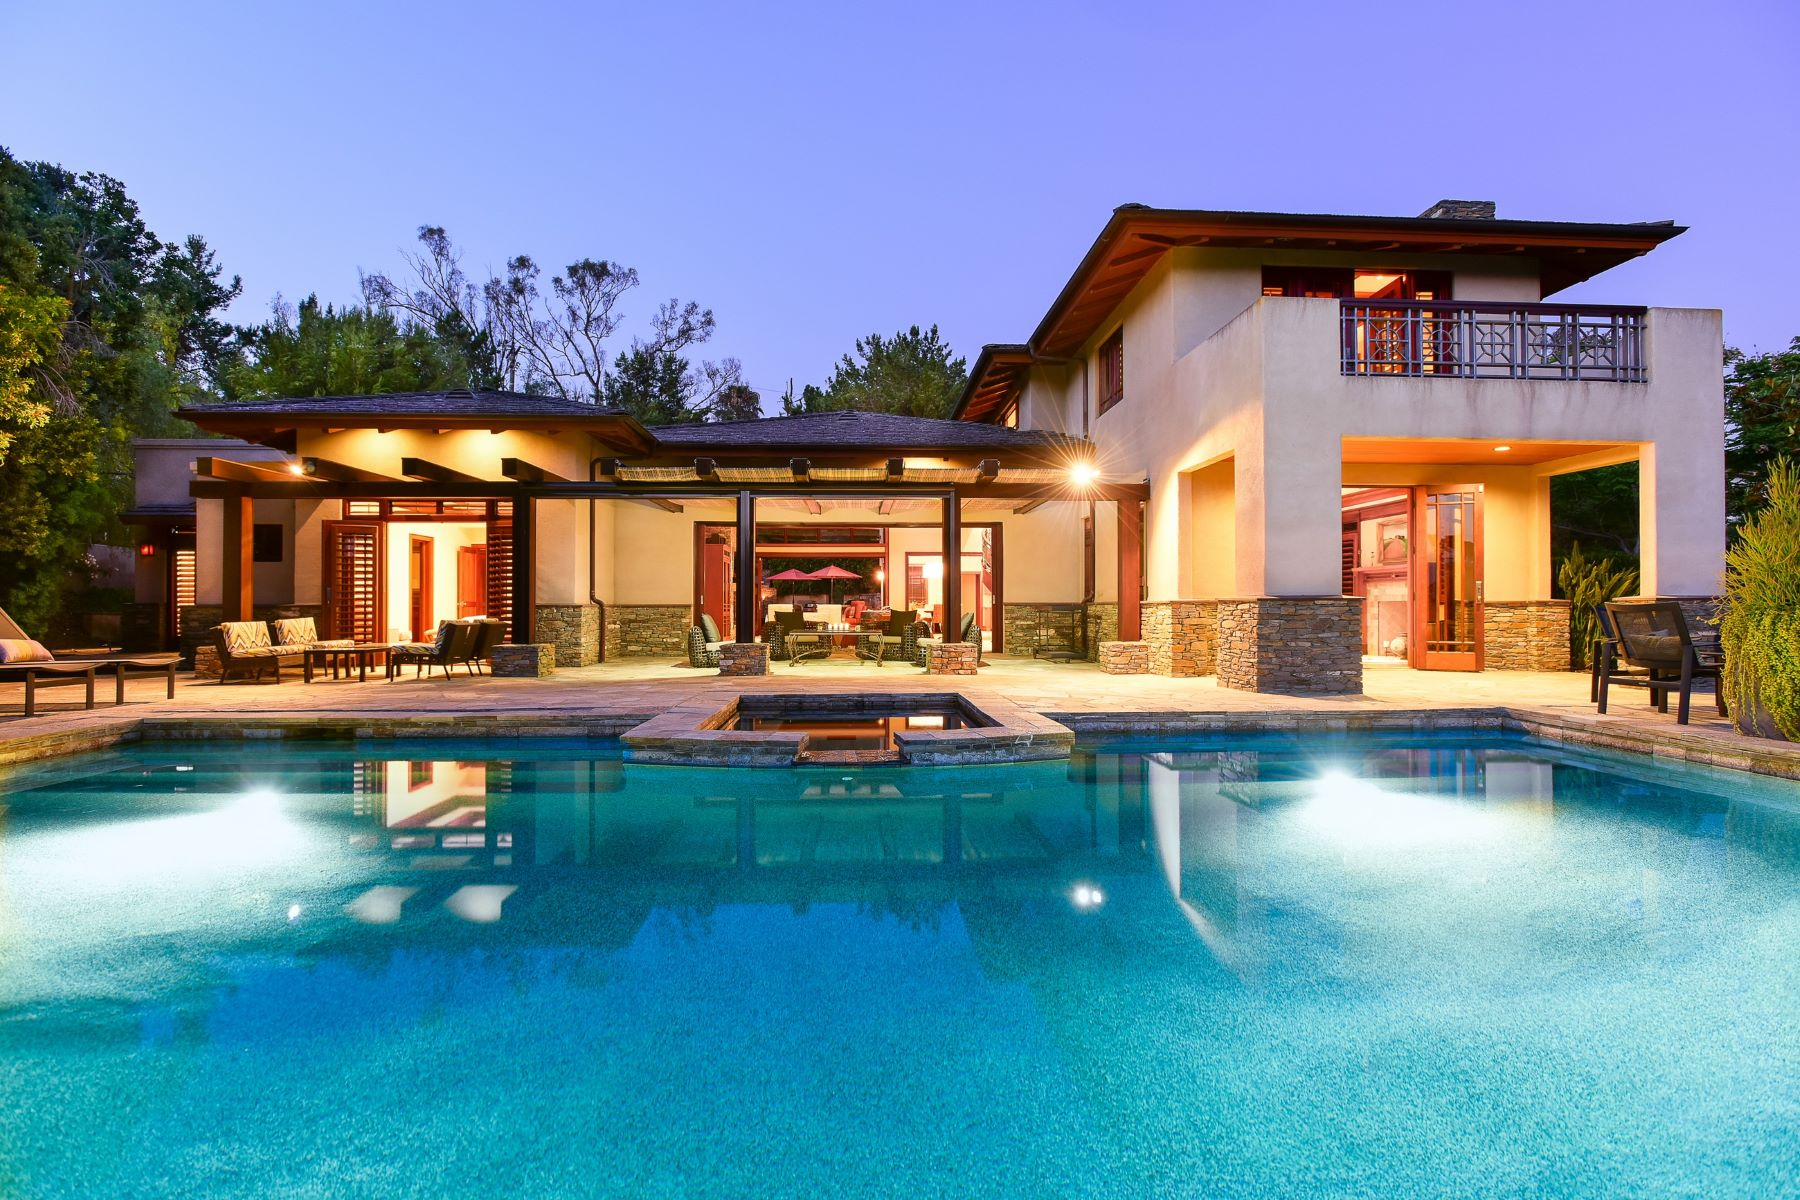 Single Family Homes for Active at 5465 La Crescenta Rancho Santa Fe, California 92067 United States